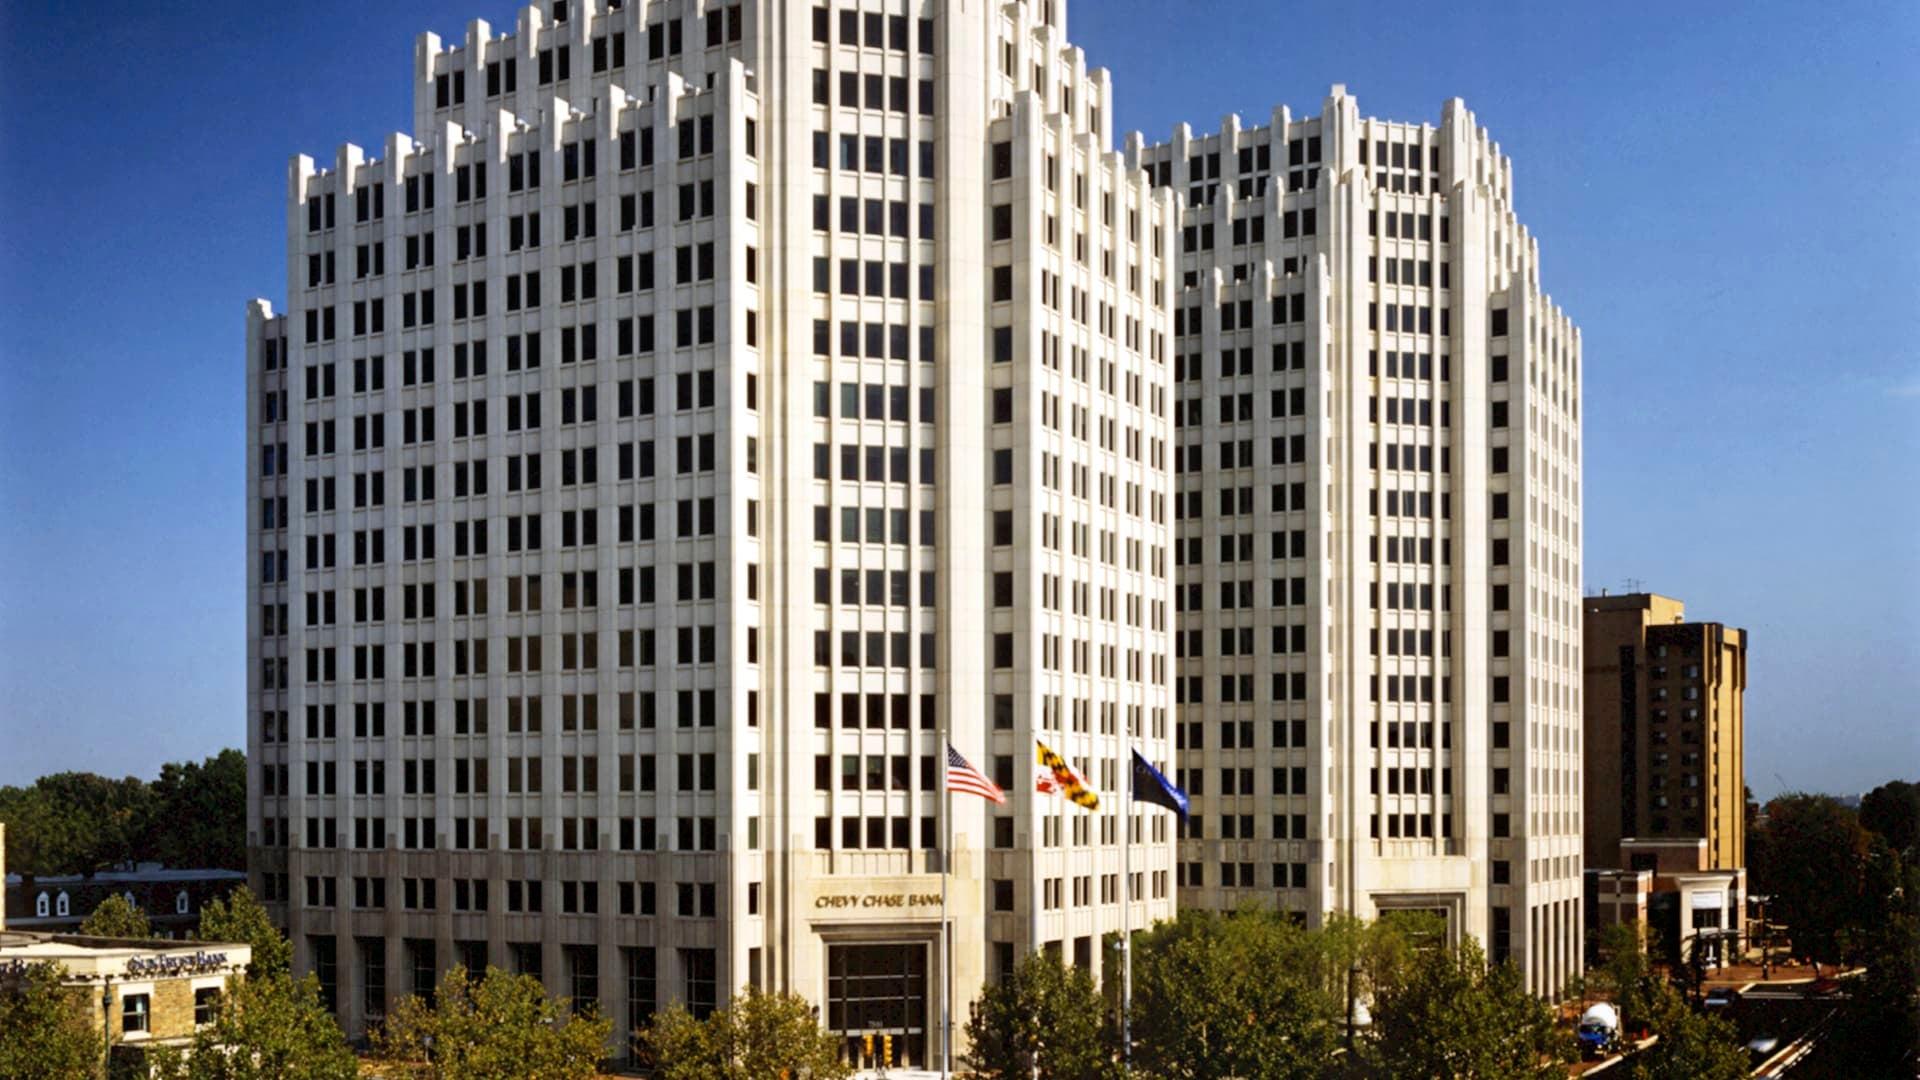 BBGM - Chevy Chase Bank HQ